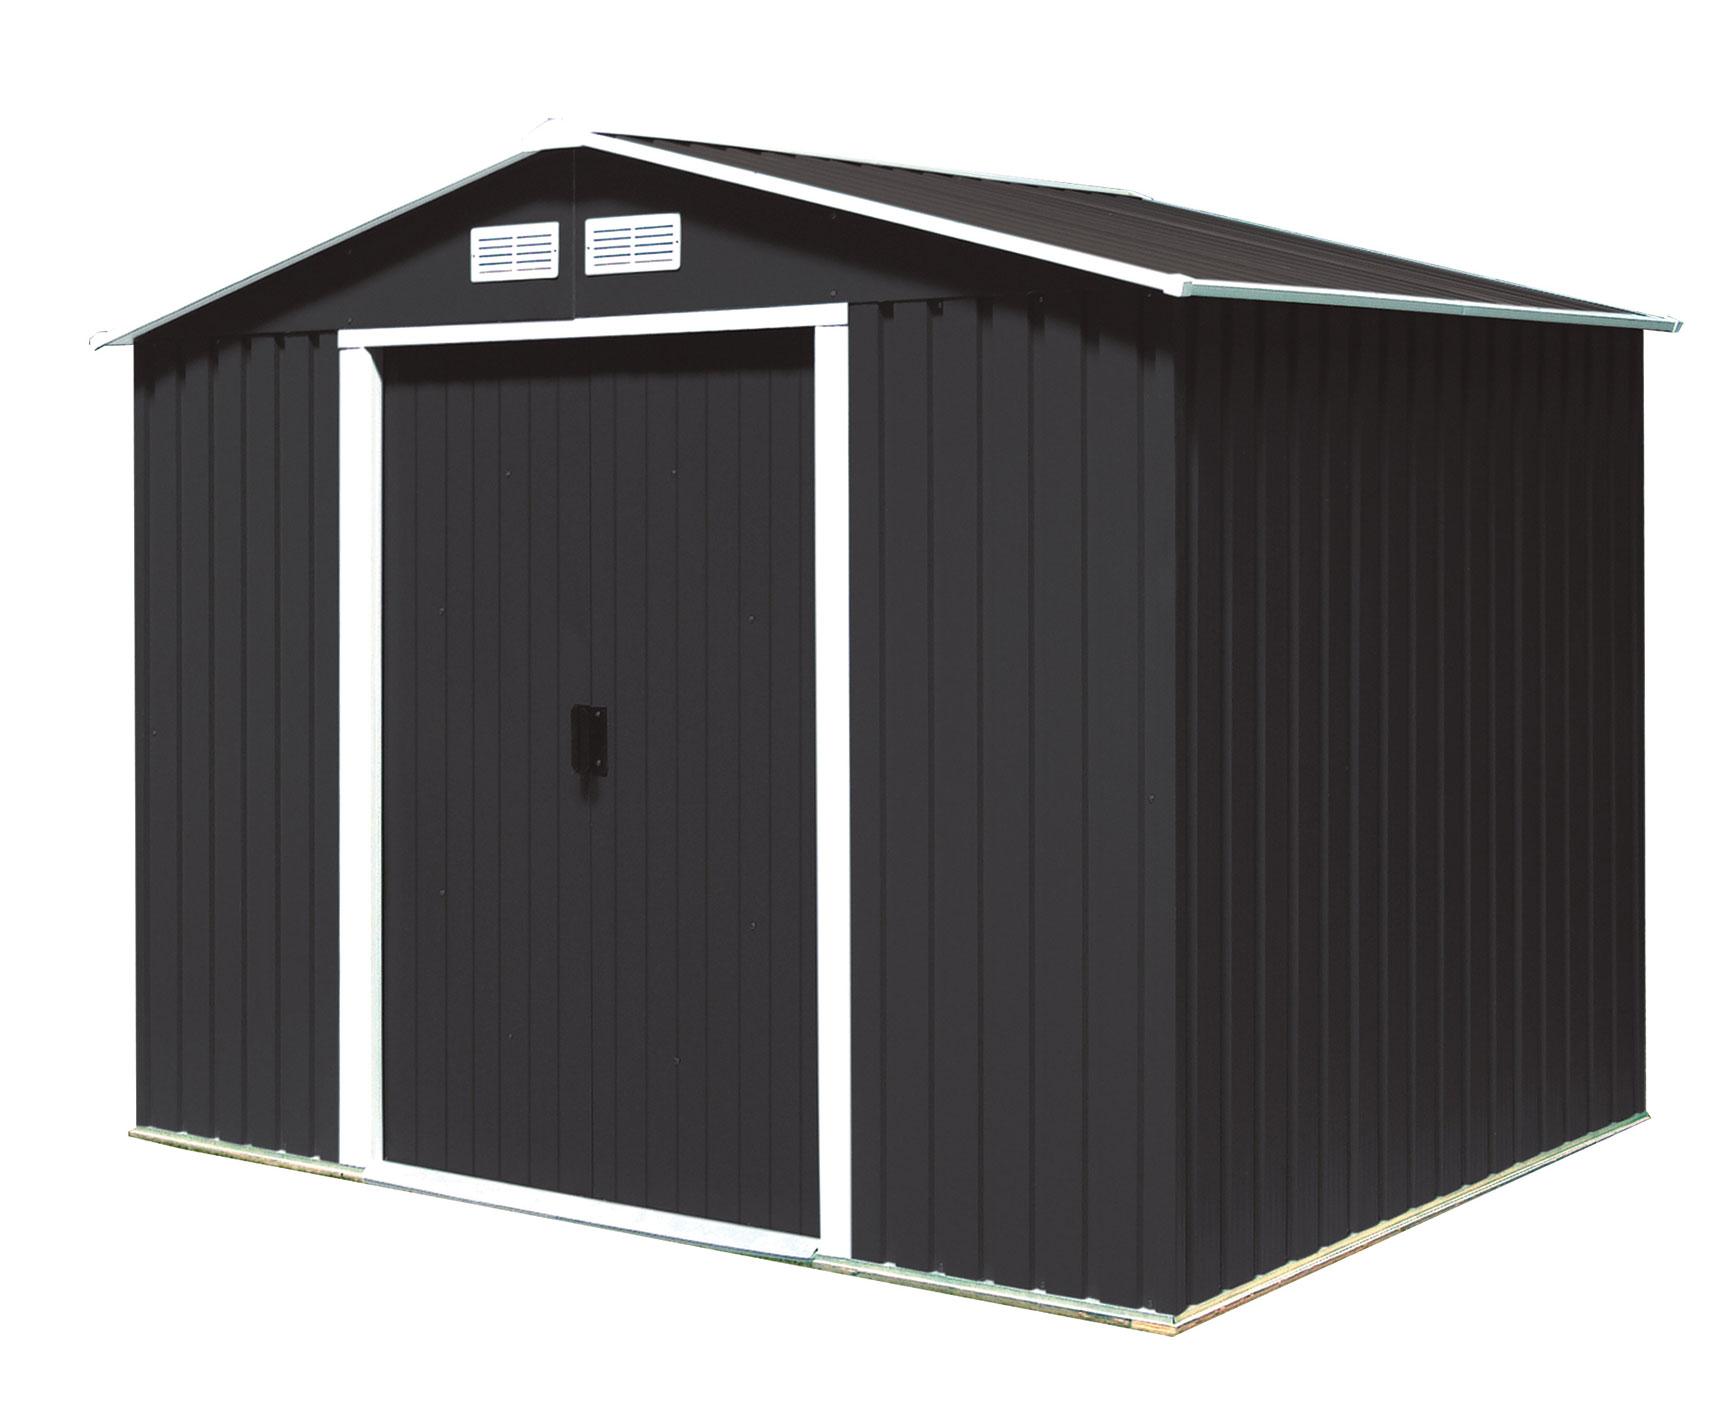 duramax ger tehaus metall titan 8x6 anthrazit 261 2x182. Black Bedroom Furniture Sets. Home Design Ideas